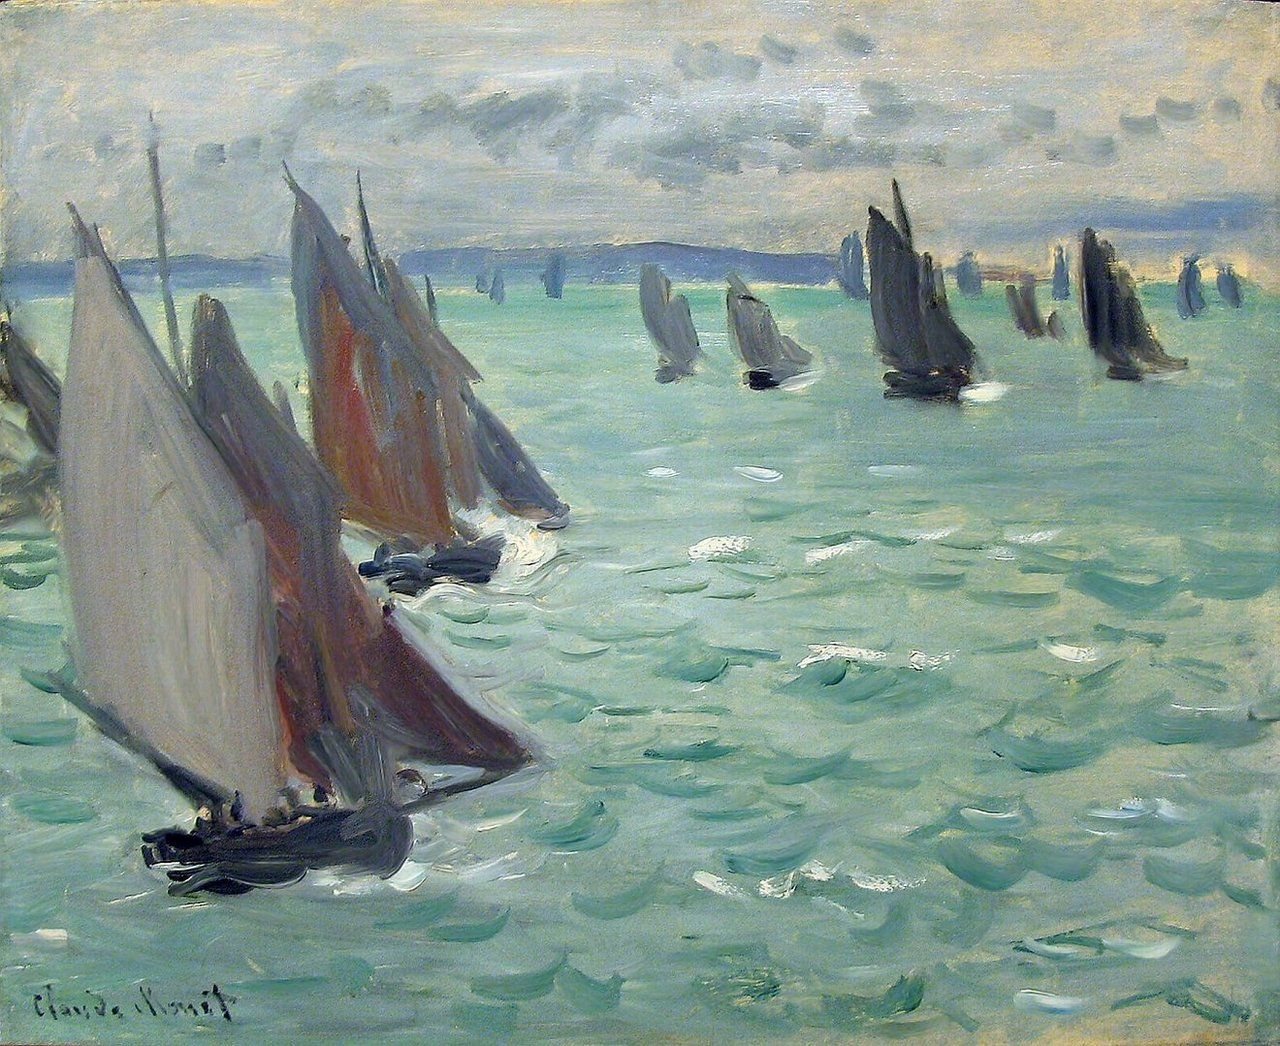 Image of Sailing and Fishing Boats on Harbor Landscape Art Shower Curtain Set